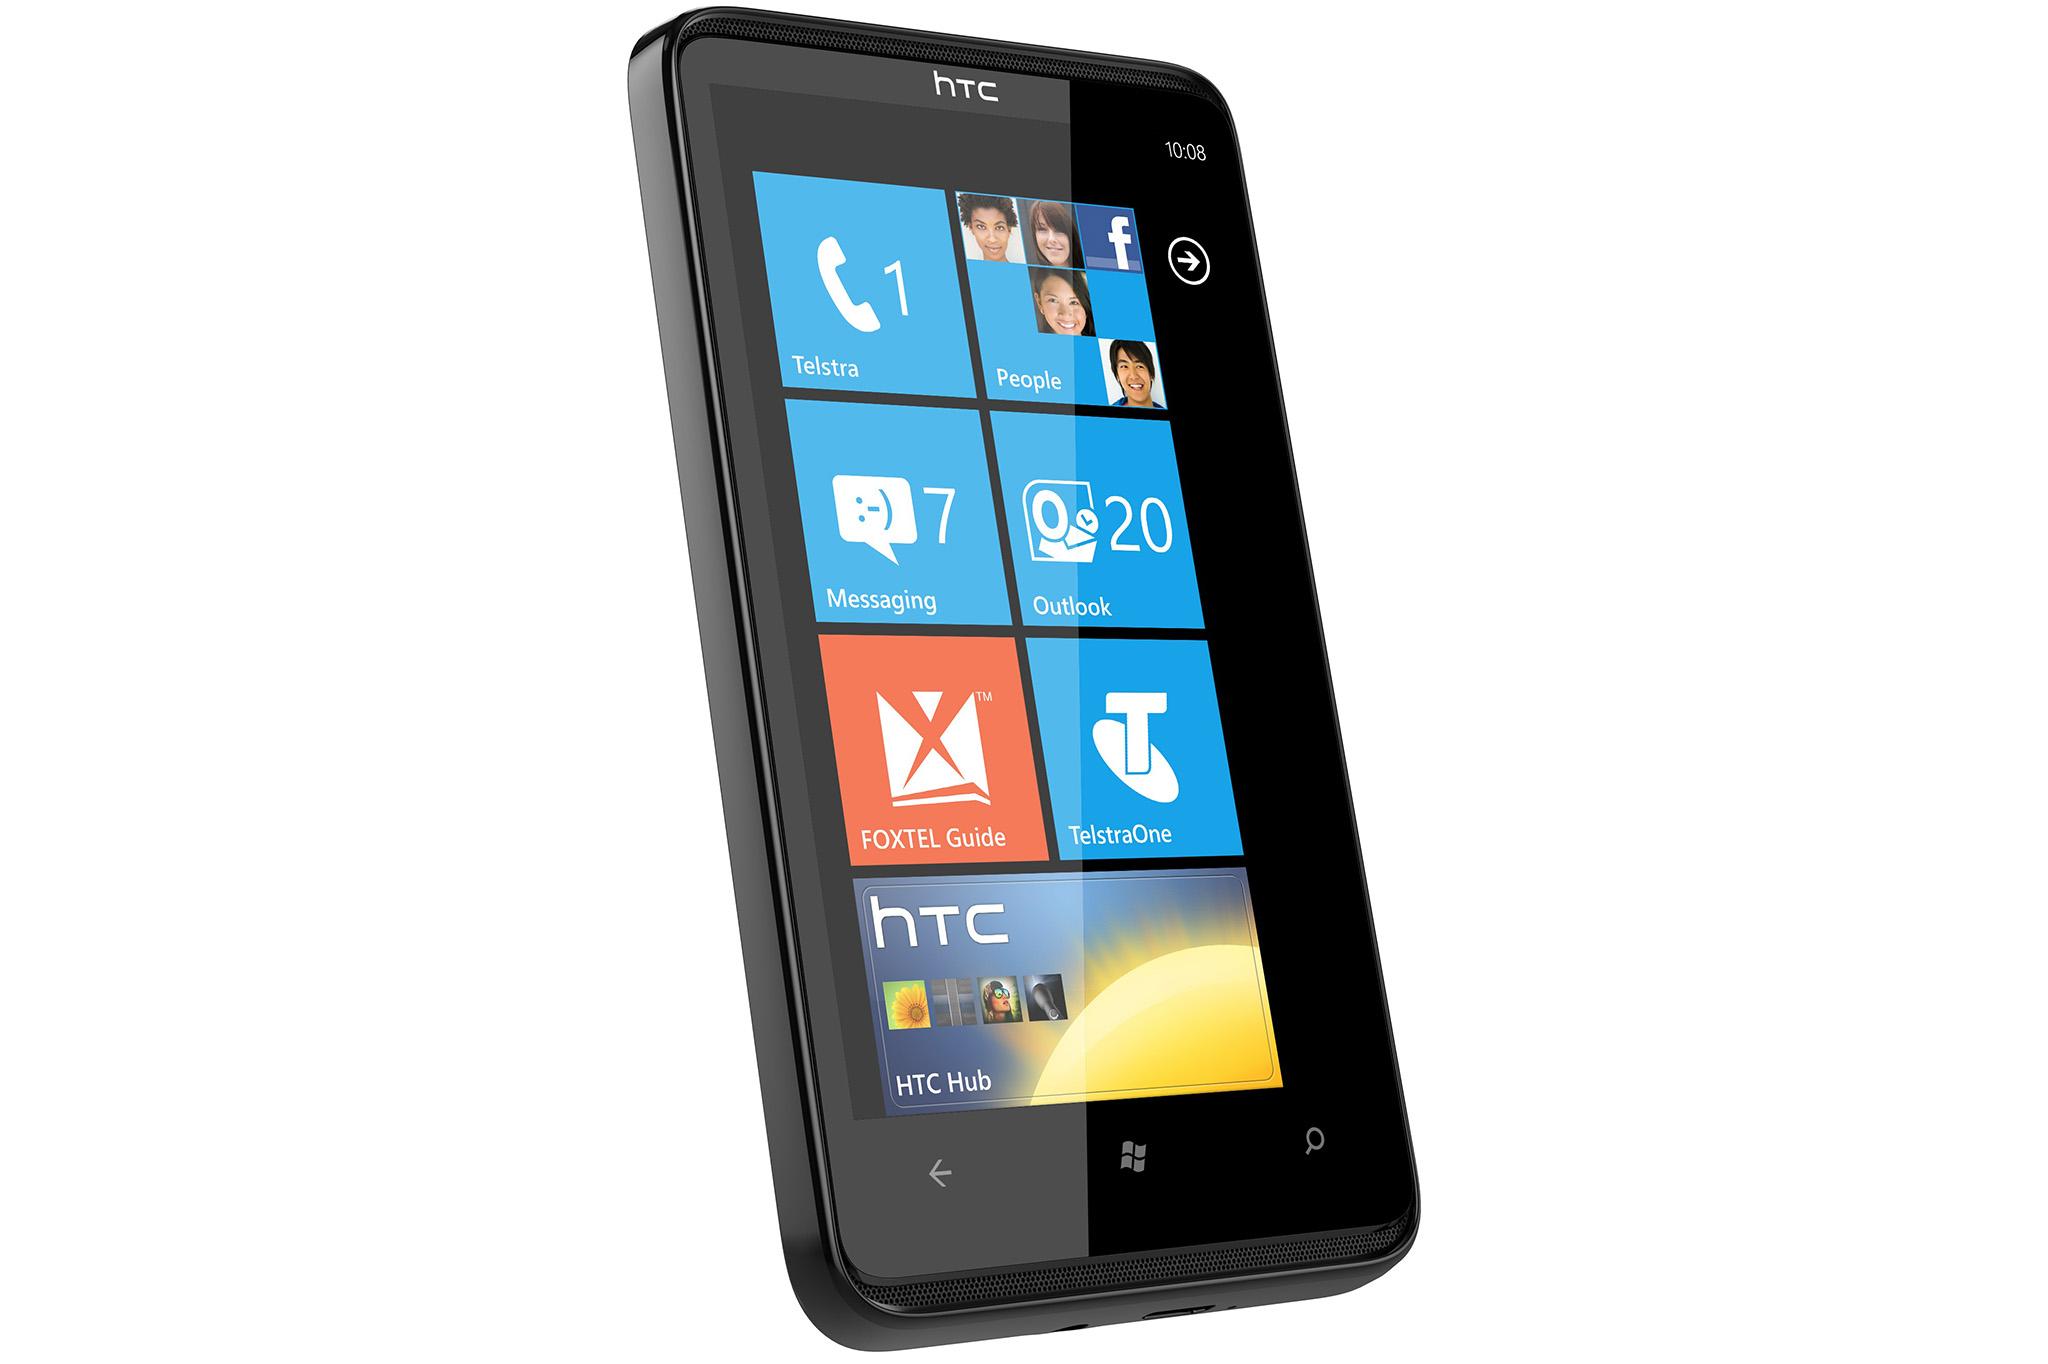 HTC-HD7-on-Next-G-network-angle.jpg